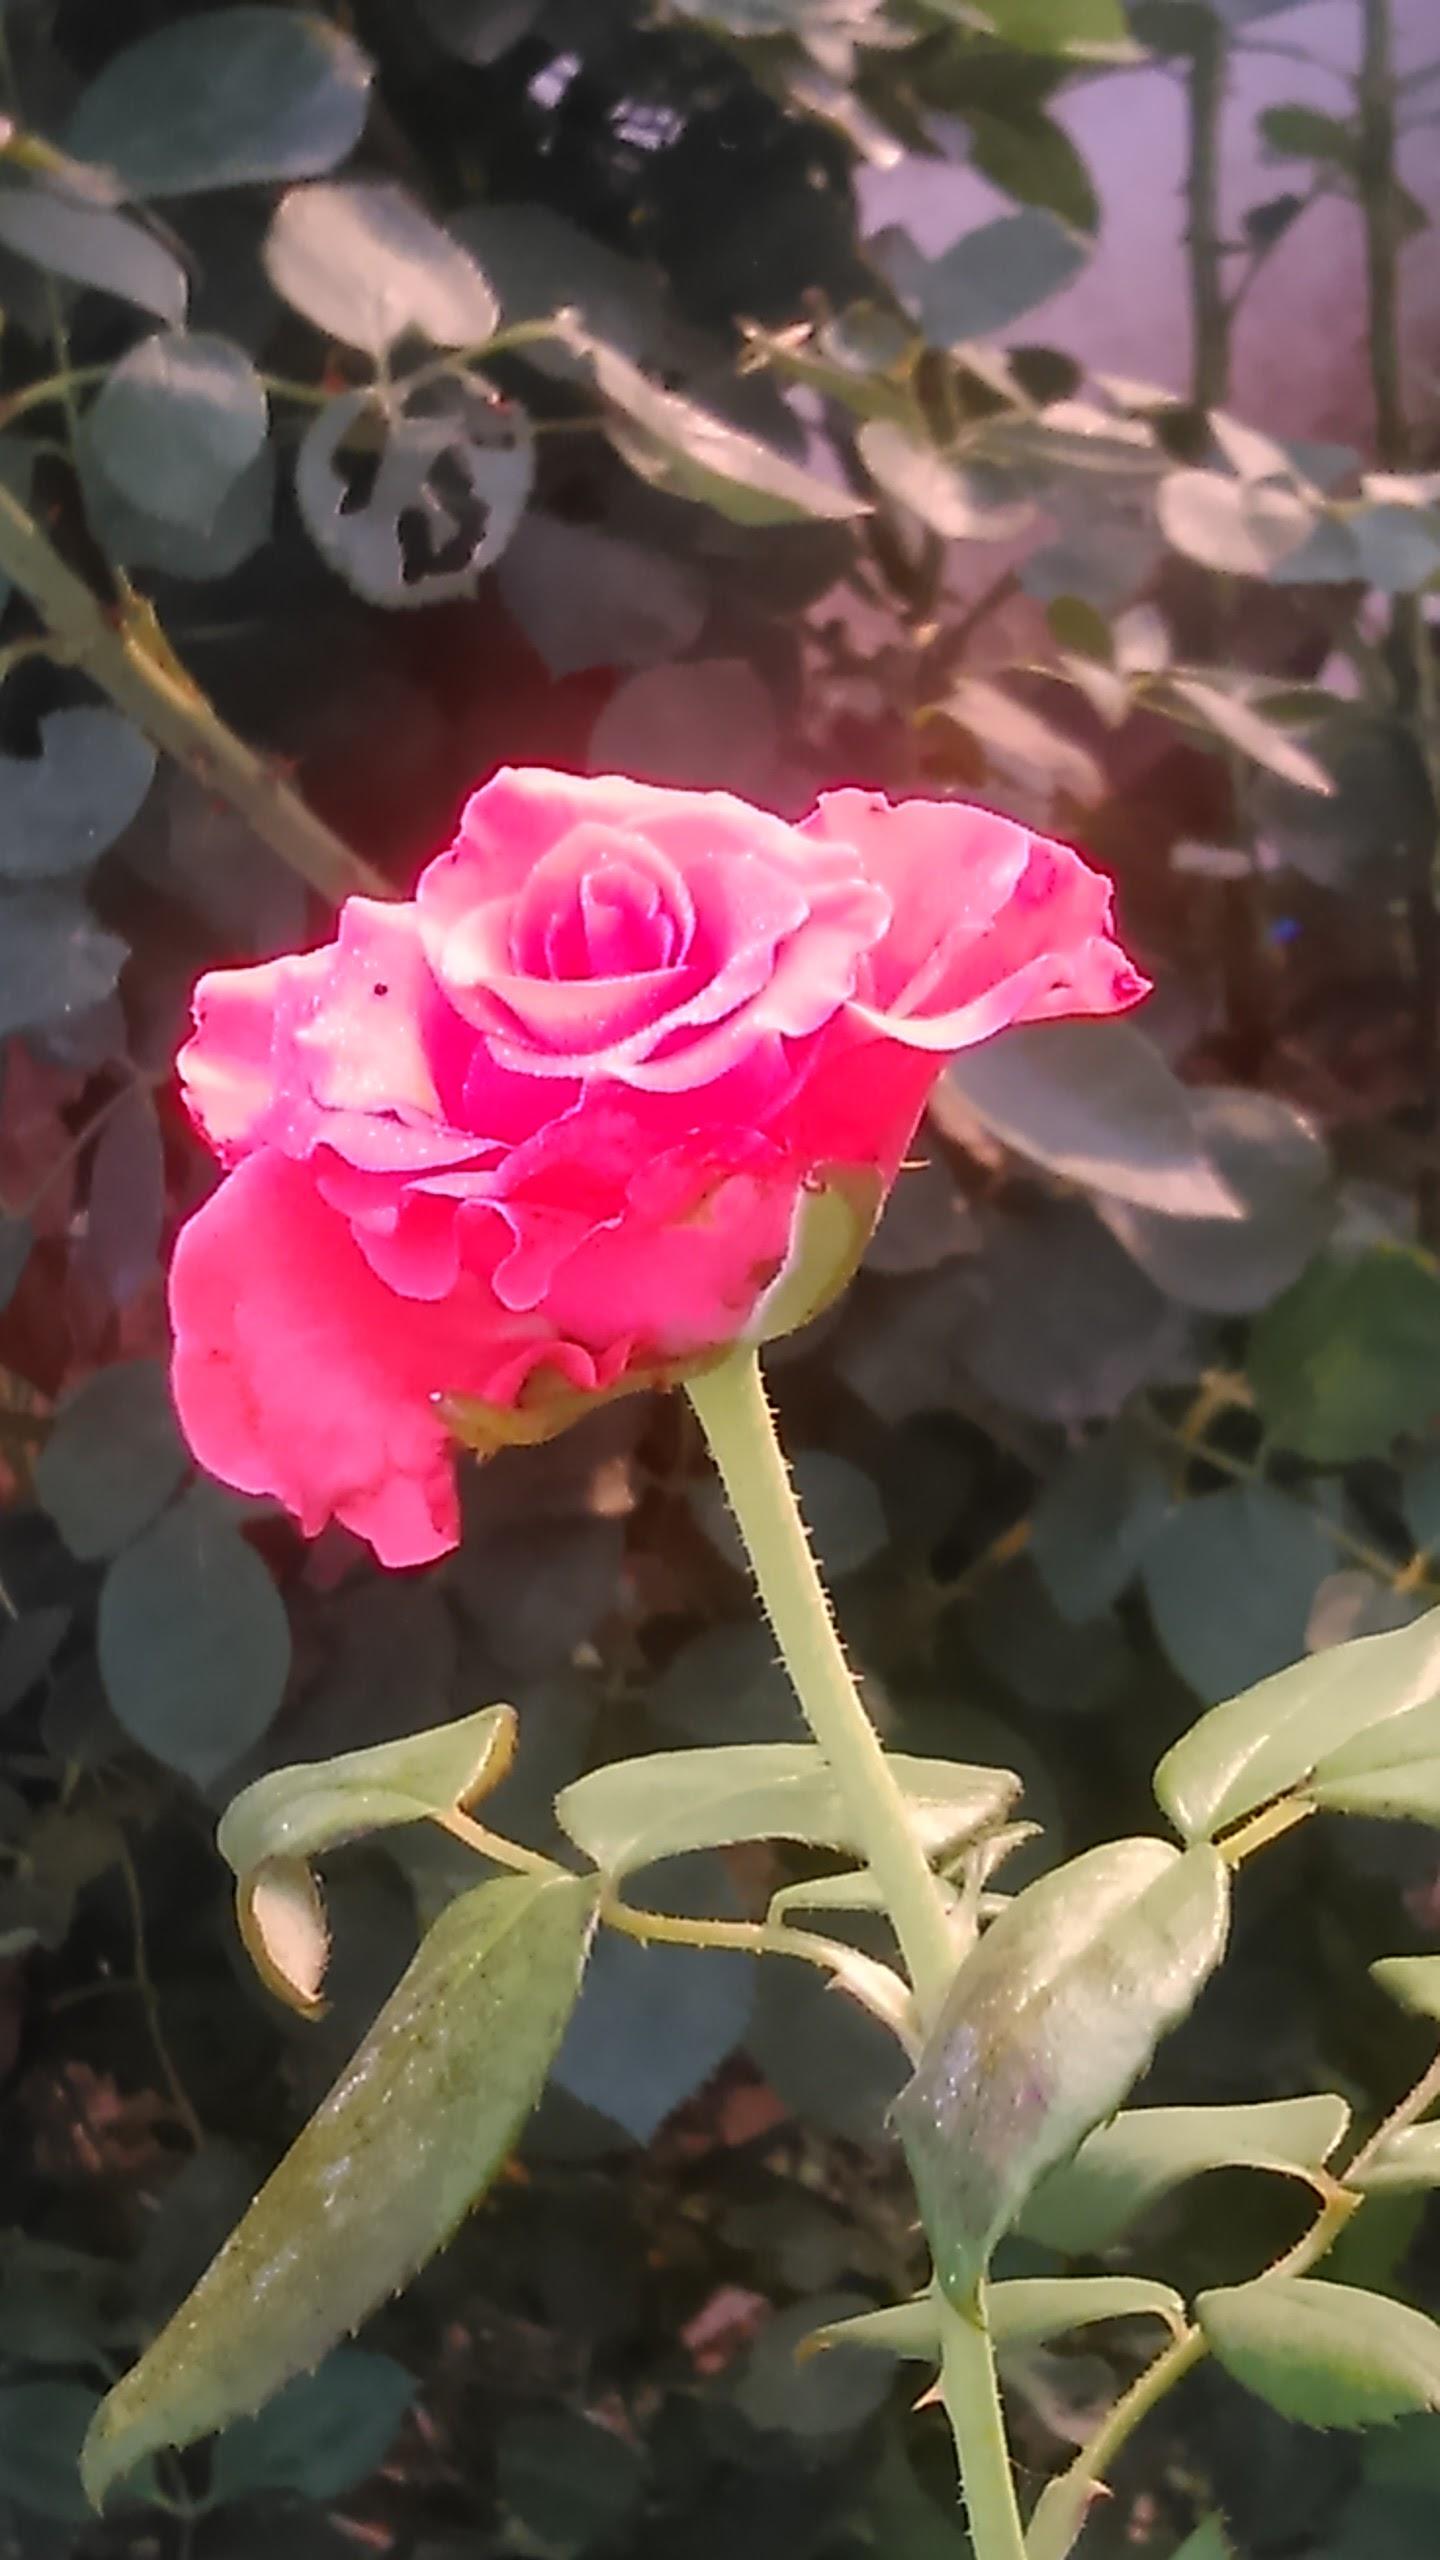 Filered Rose Symbol Of Loveg Wikimedia Commons